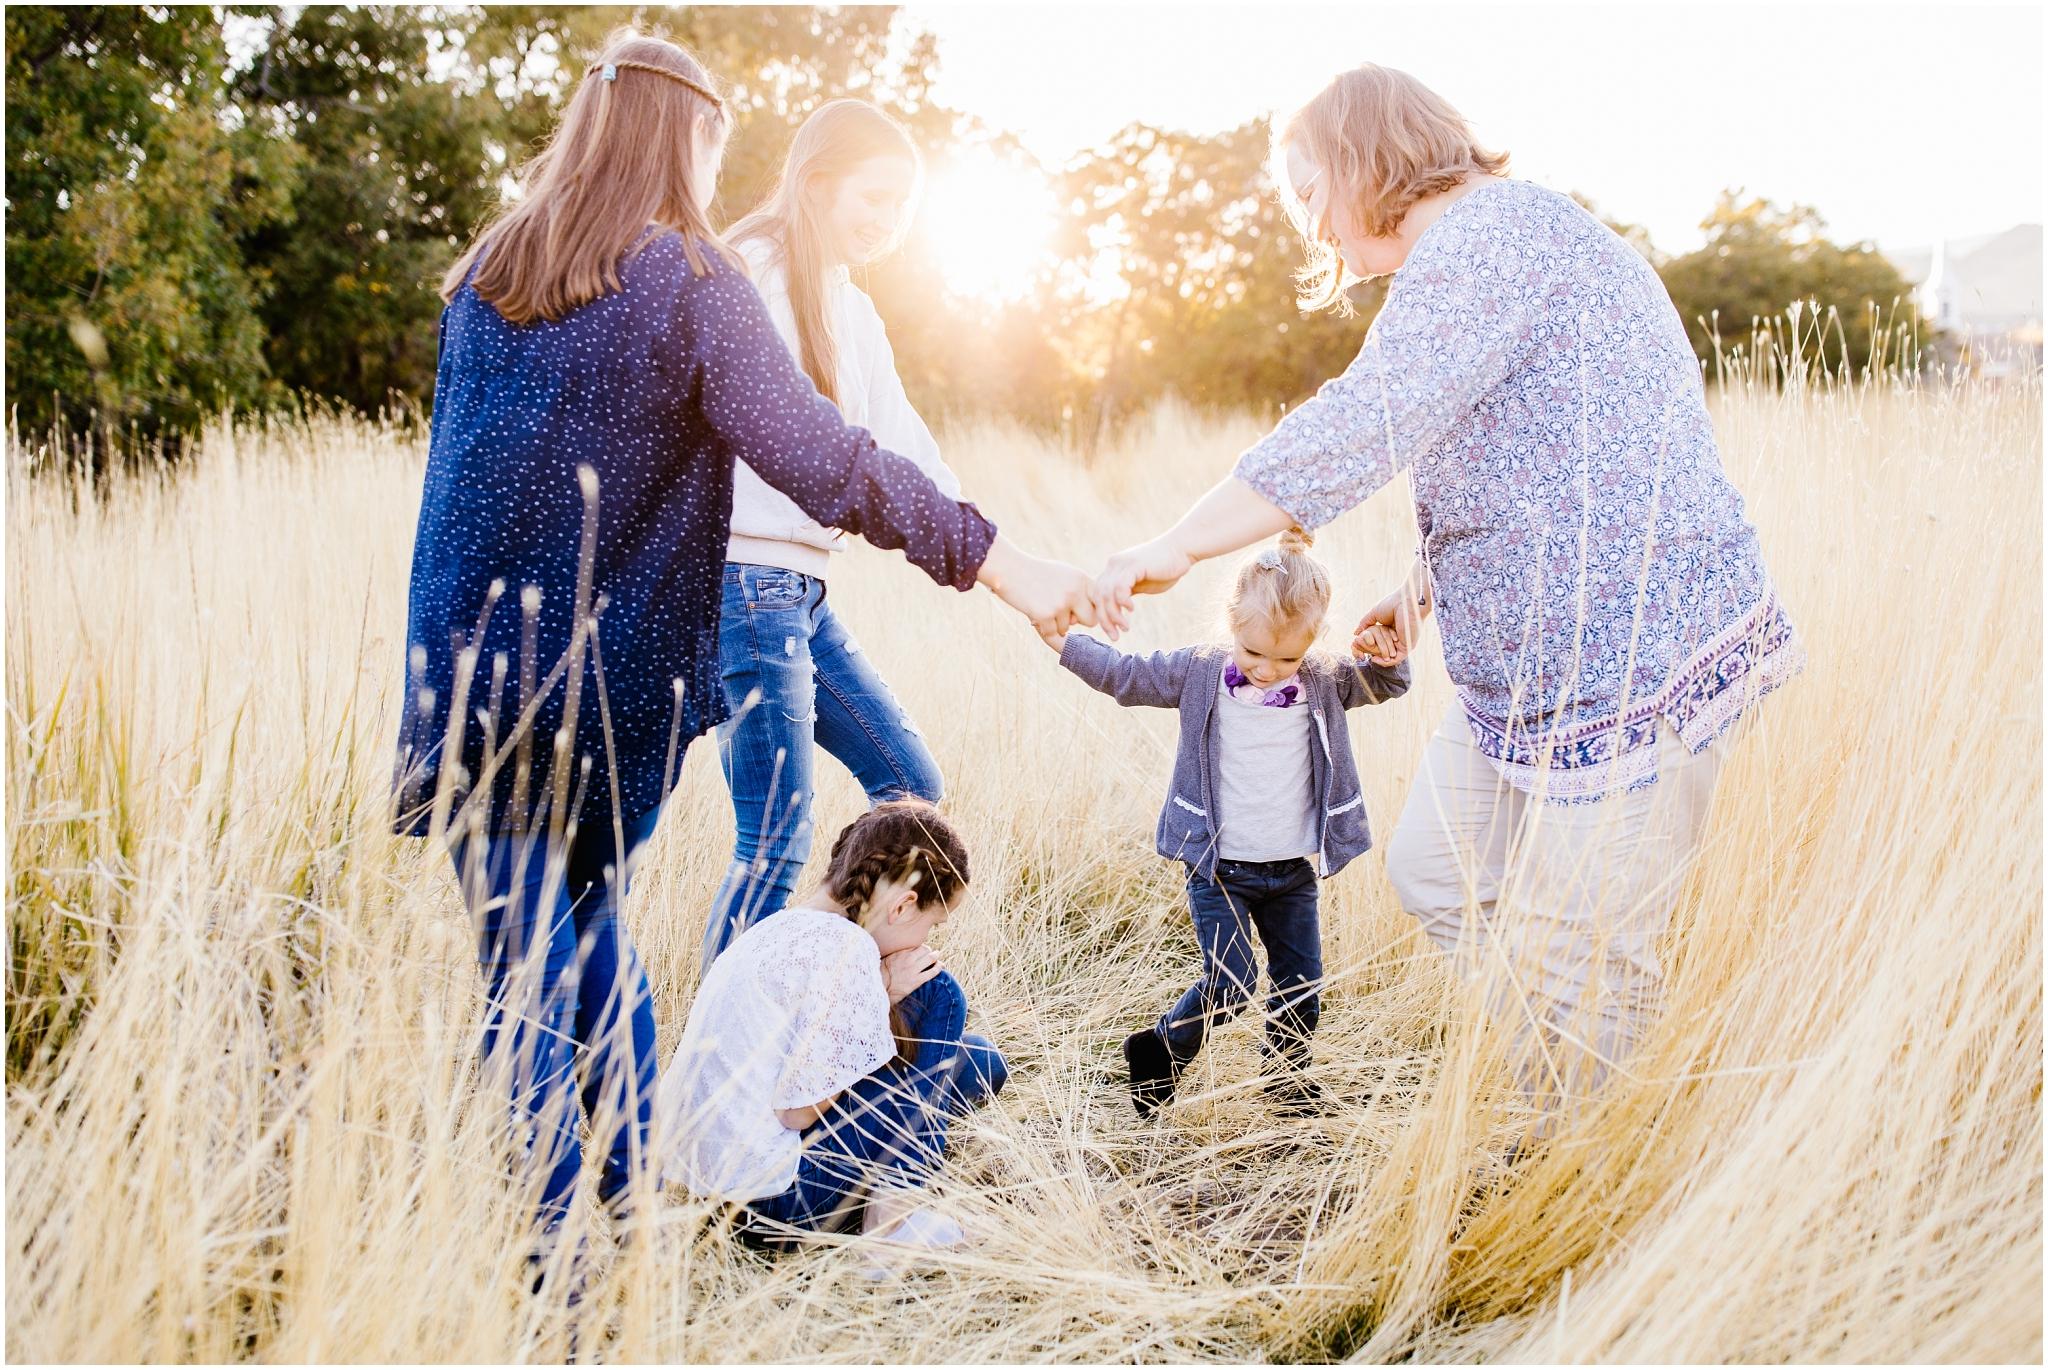 Jaursch-118_Lizzie-B-Imagery-Utah-Family-Photographer-Salt-Lake-City-Park-City-Herriman-Utah-County.jpg